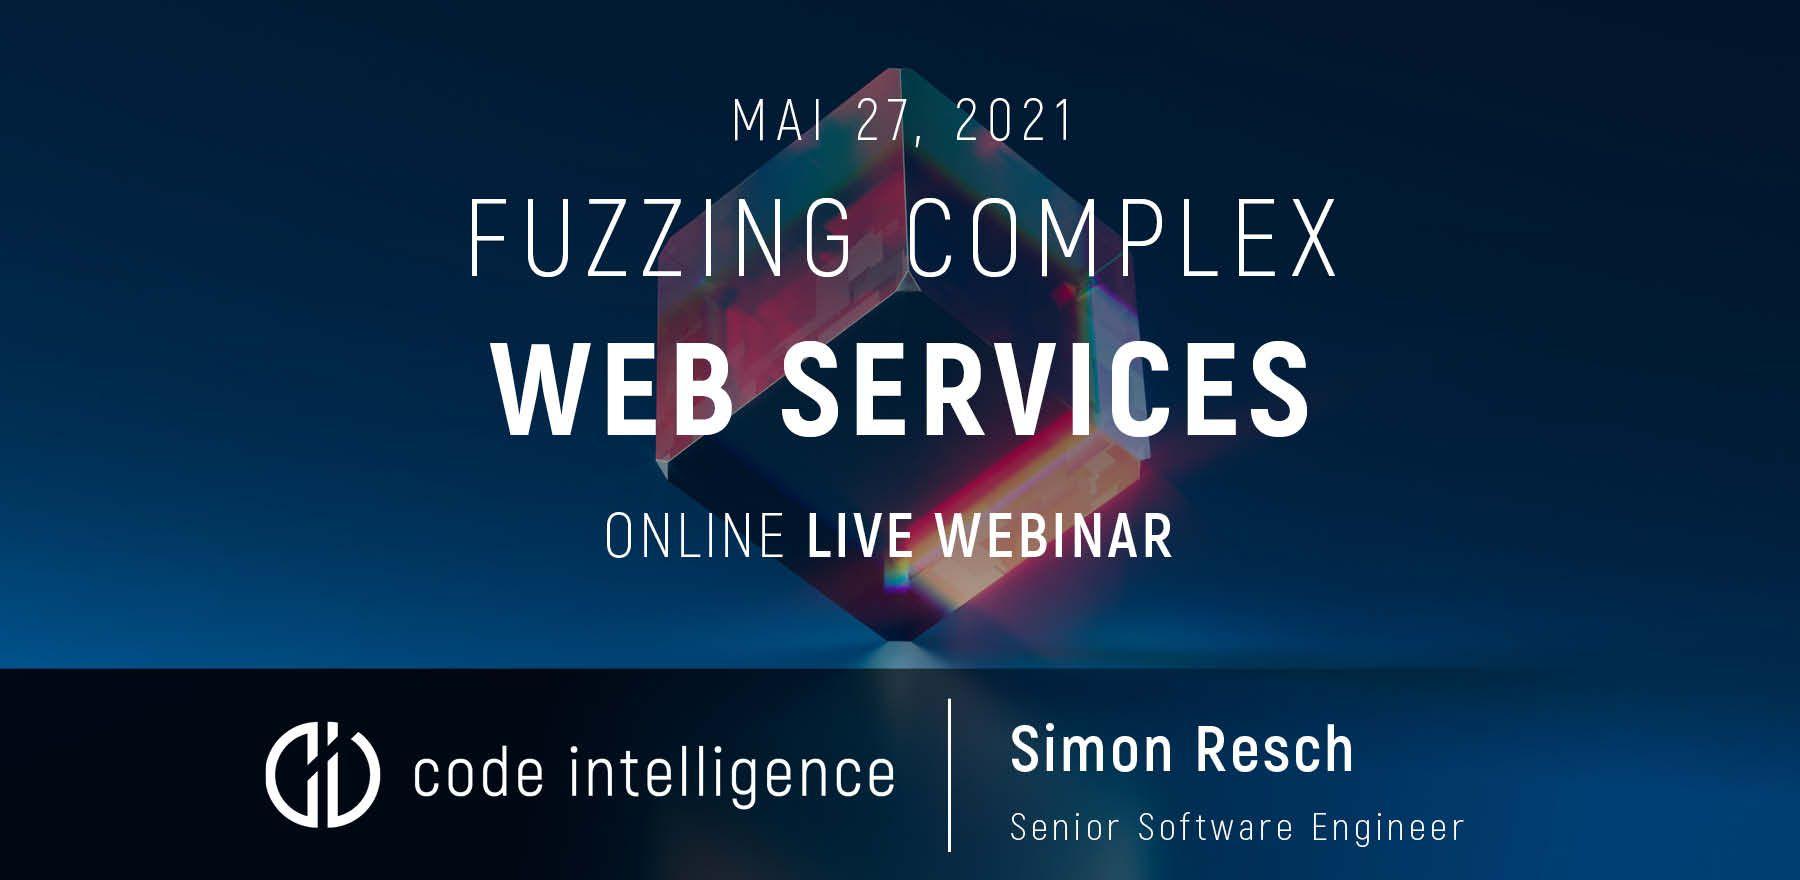 Fuzzing Complex Web Services Webinar